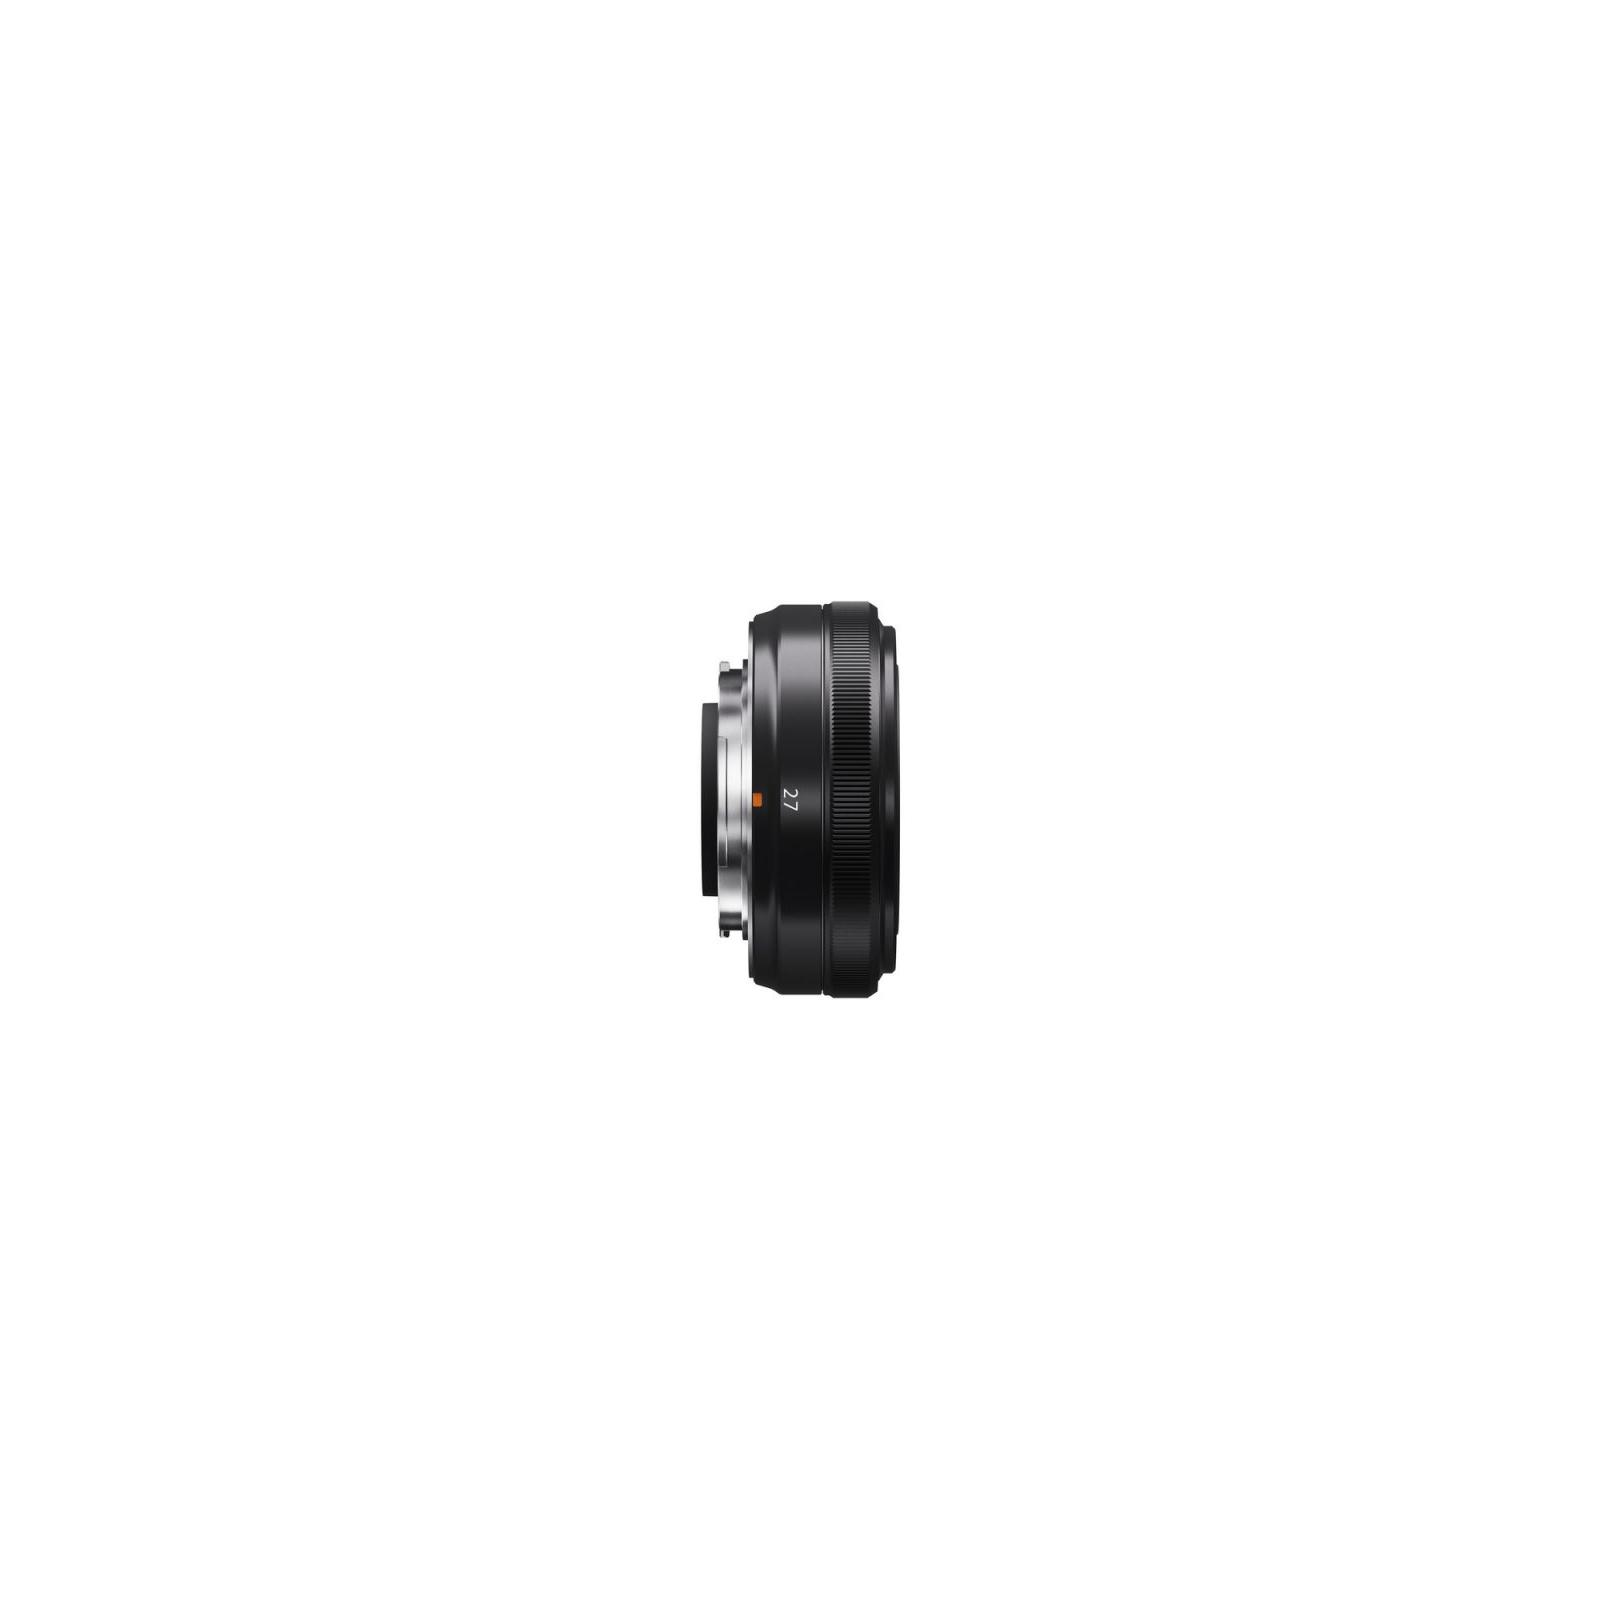 Объектив Fujifilm XF-27mm F2.8 (16389123) изображение 5